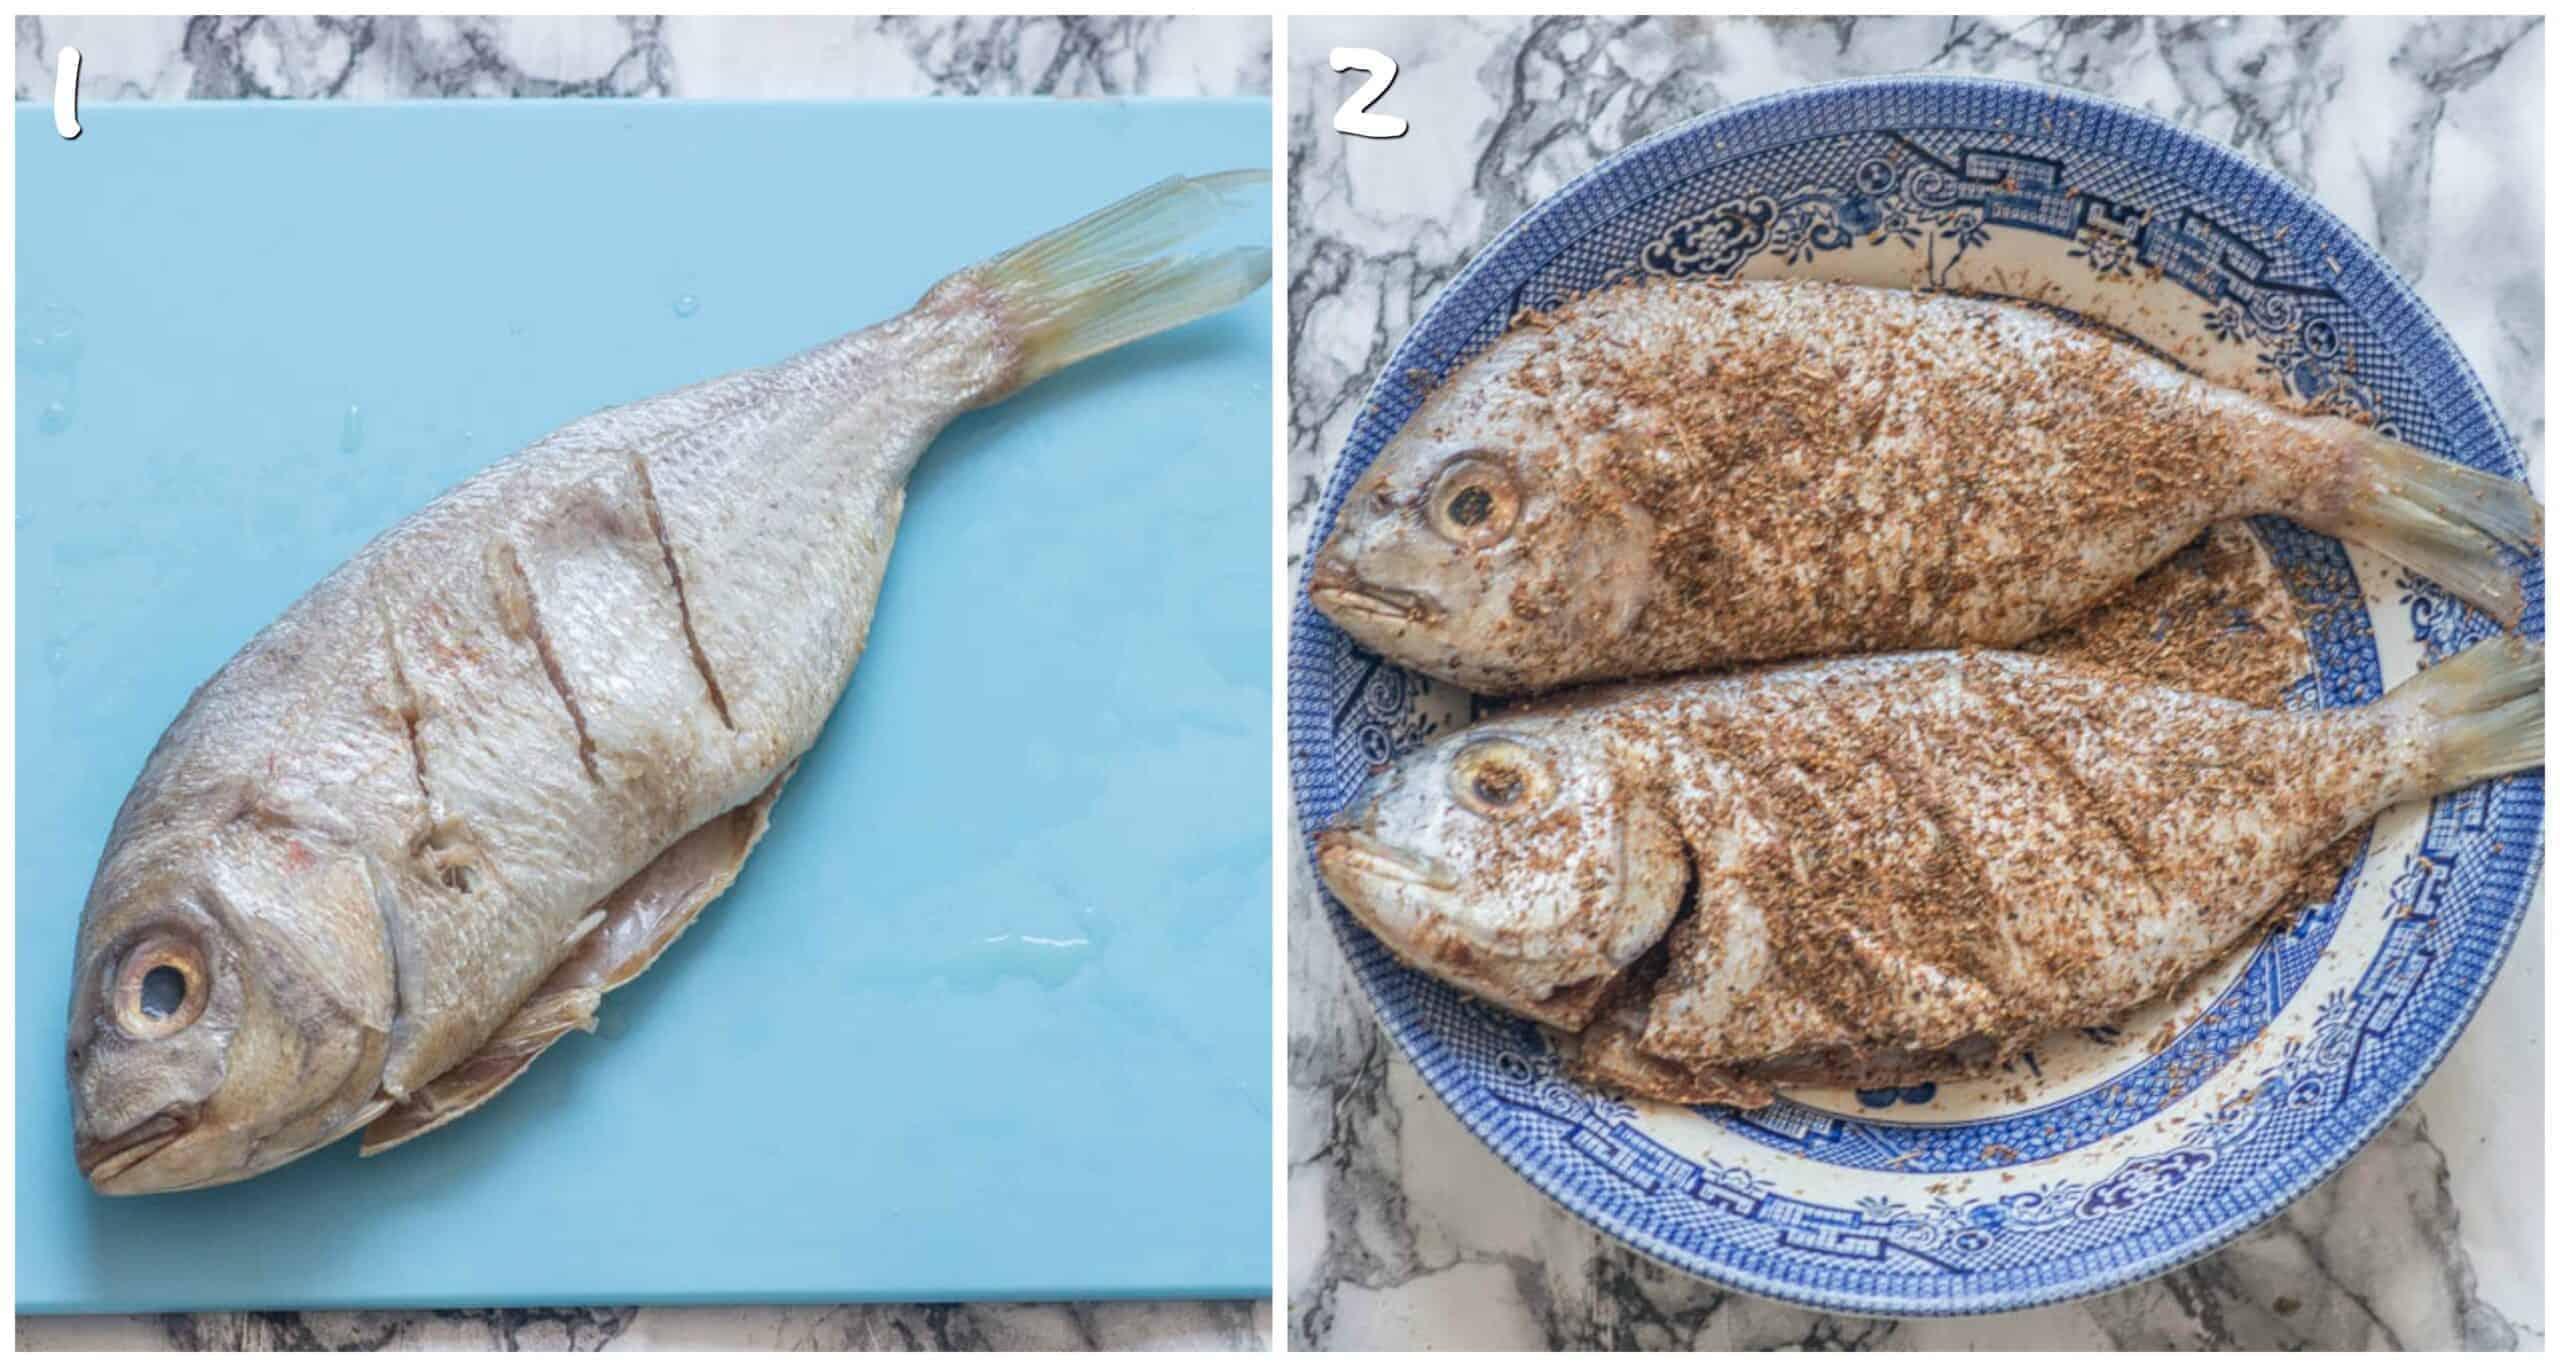 steps 1-2 slashing fish and seasoning fish